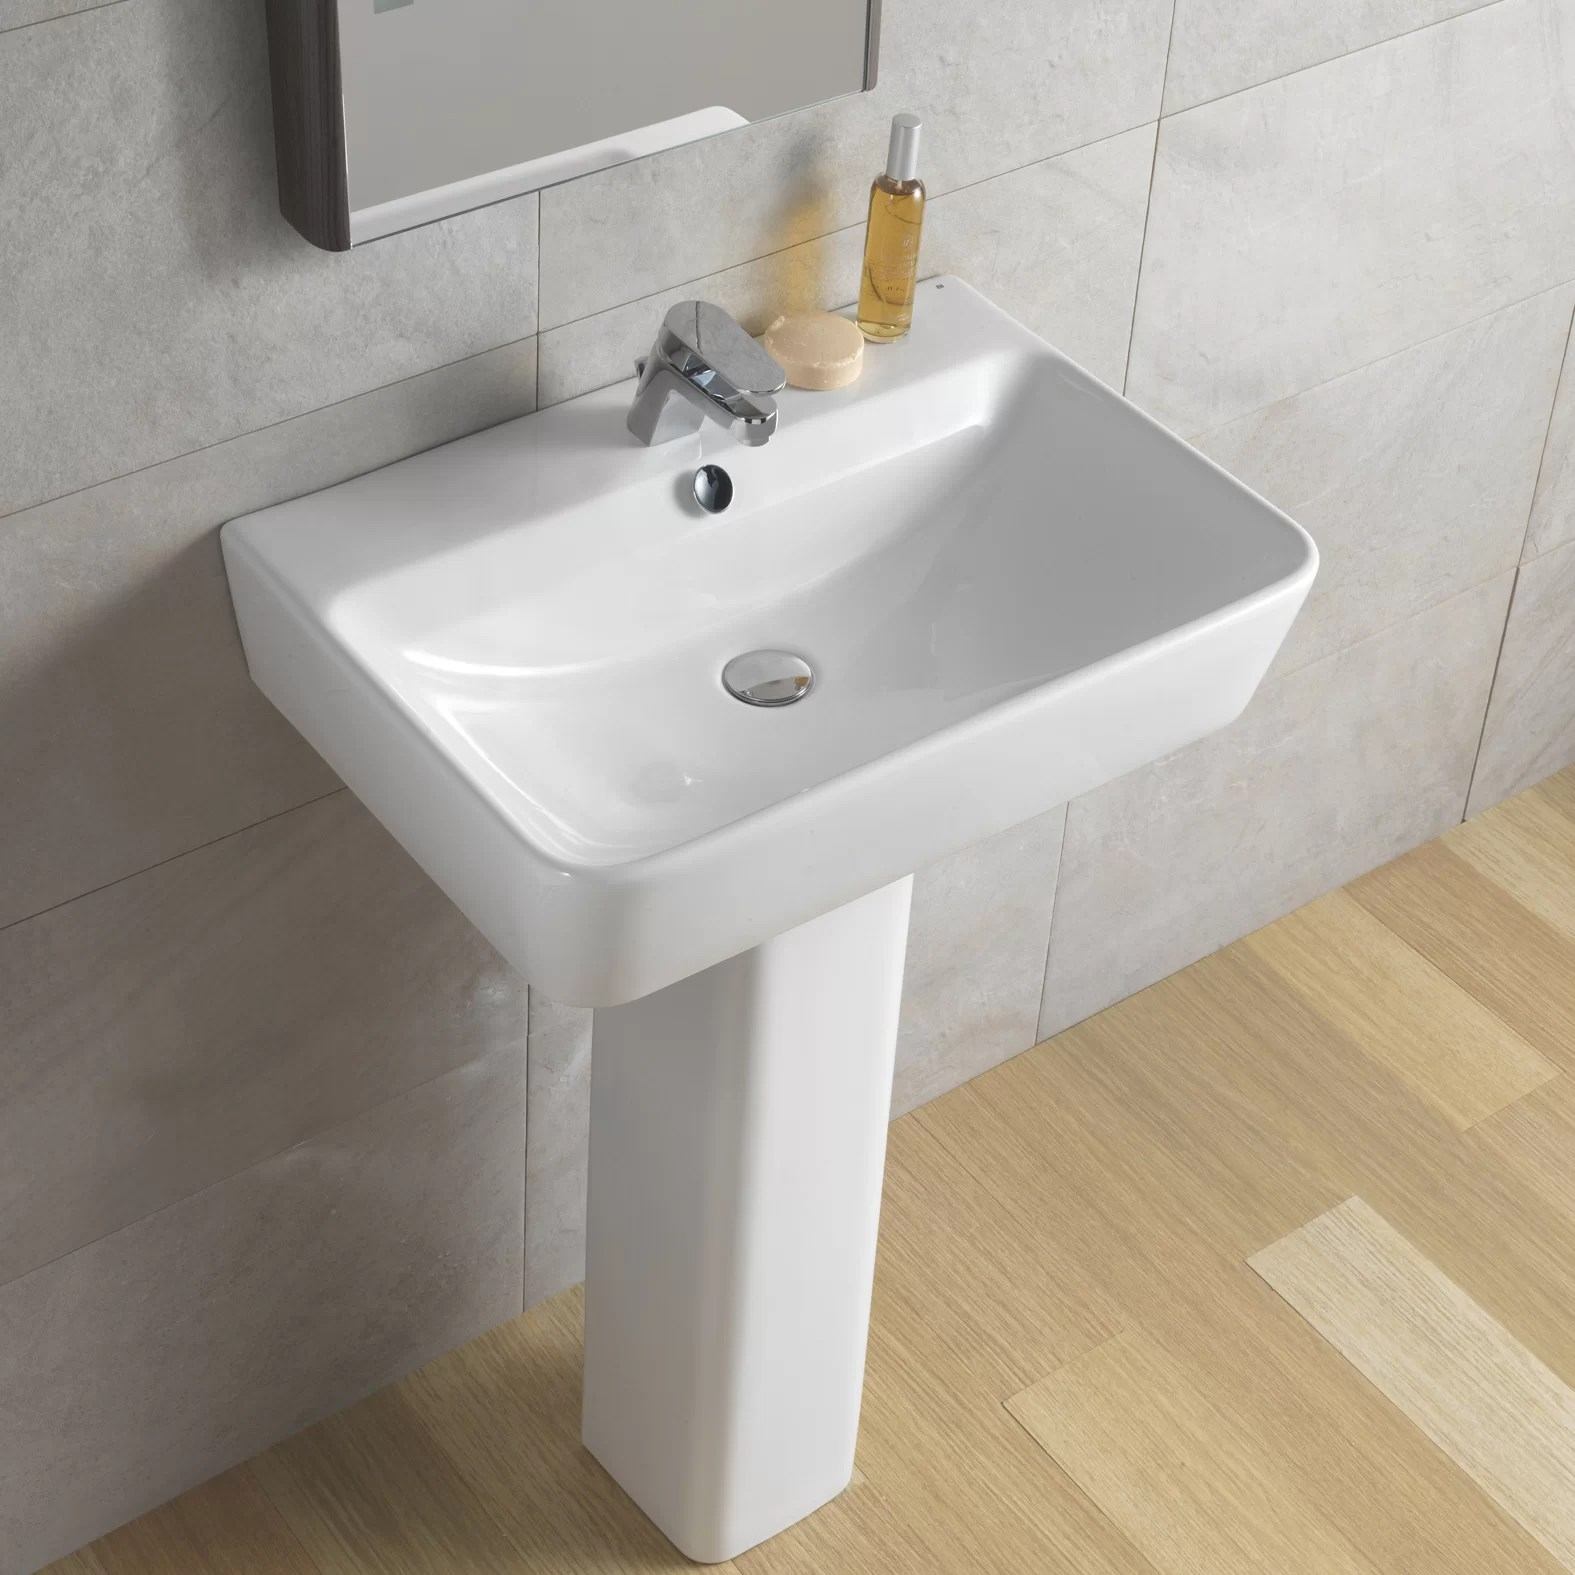 Bissonnet Emma Full Pedestal Overflow Bathroom Sink  Reviews  Wayfair